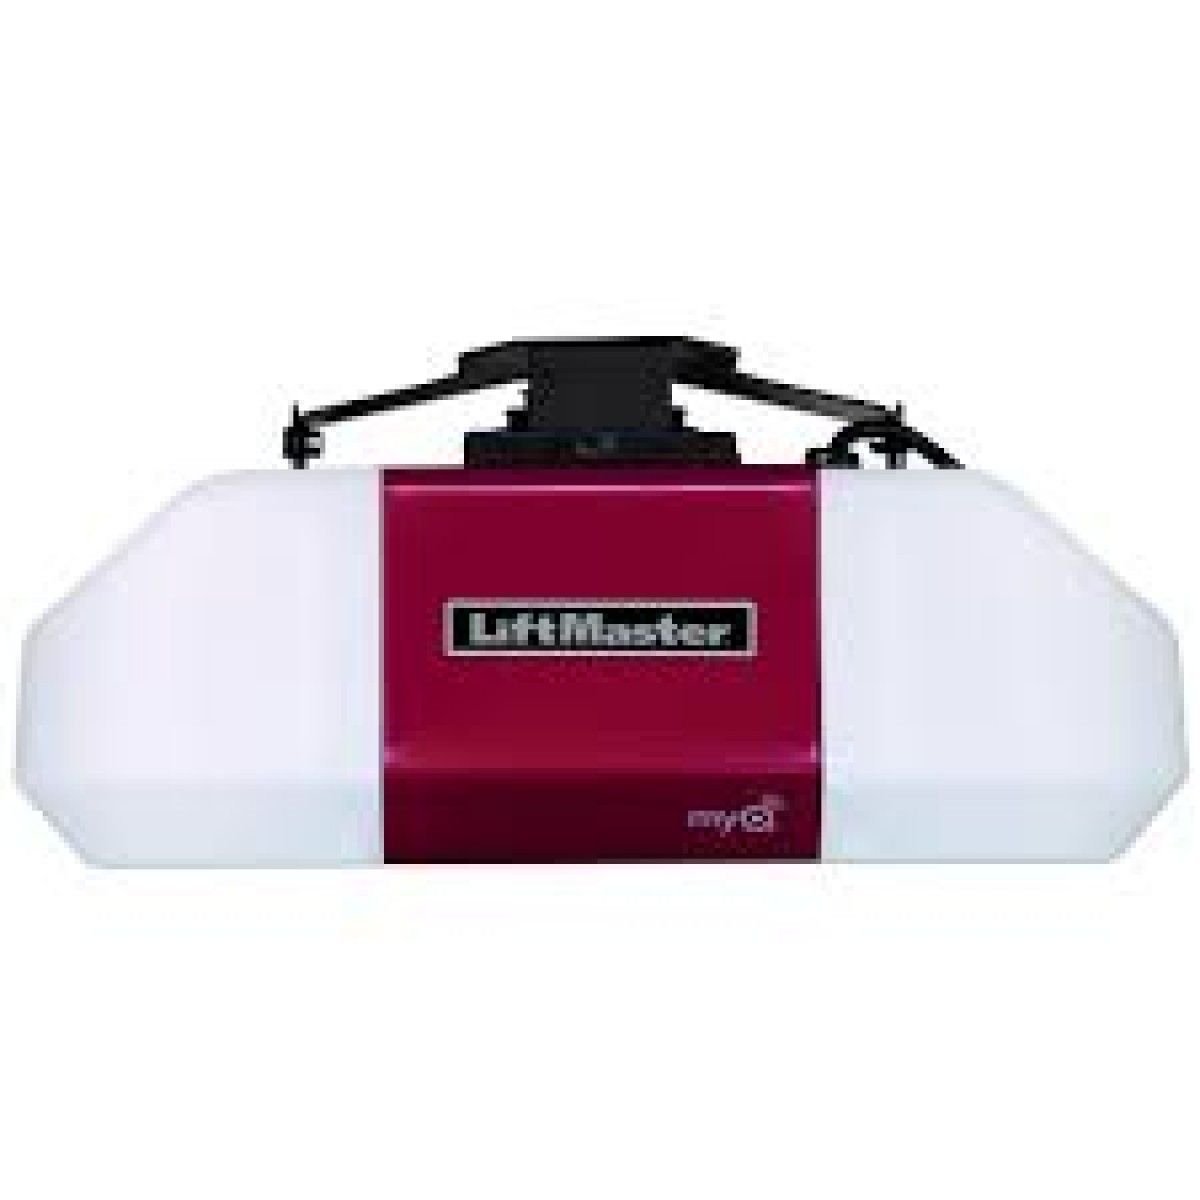 Liftmaster 8587w 3 4 Hp Ac Chain Drive Wi Fi Garage Door Opener Best Garage Door Opener Garage Door Opener Liftmaster Garage Door Opener